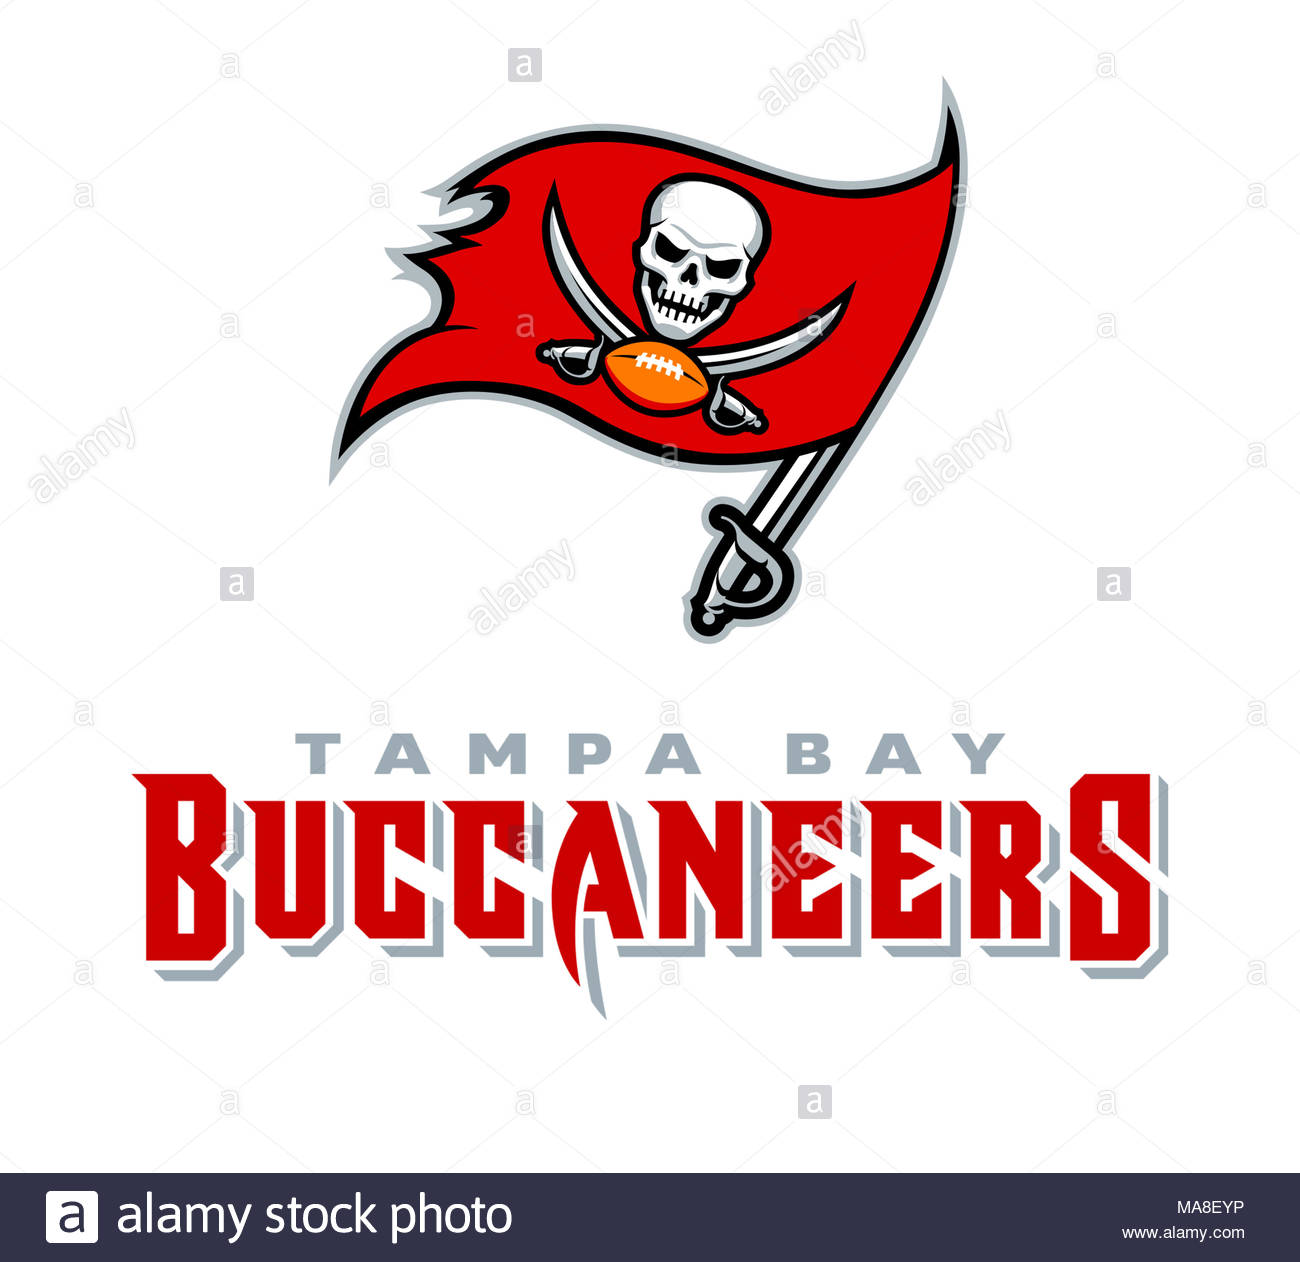 Tampa Bay Buccaneers logo icon Stock Photo  178437610 - Alamy fdbff042cd8